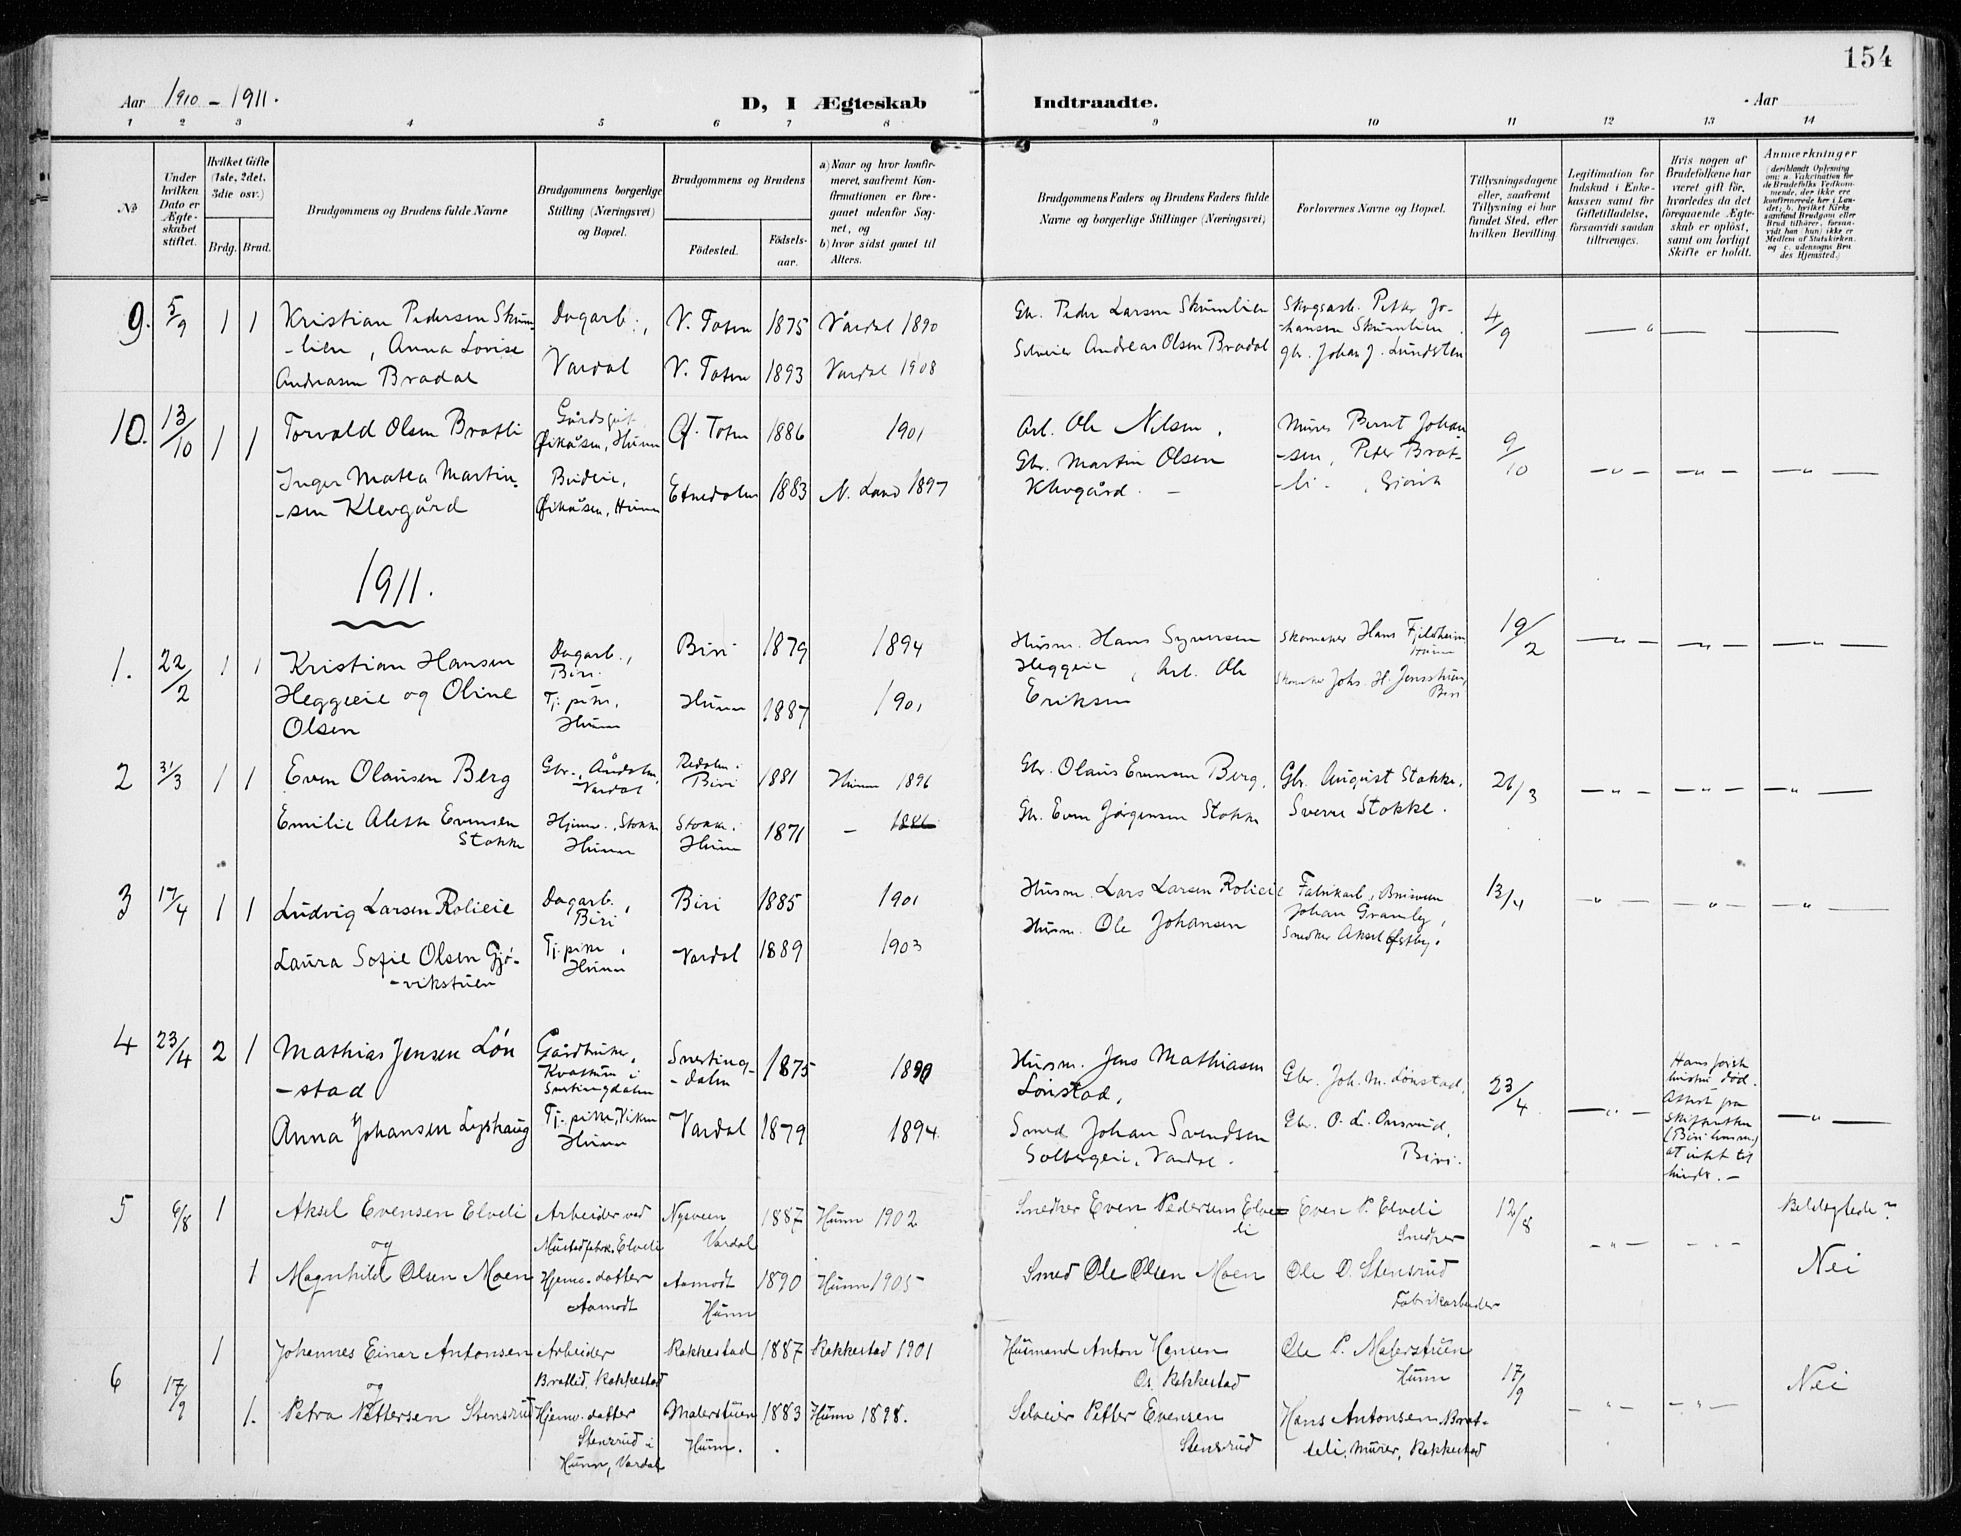 SAH, Vardal prestekontor, H/Ha/Haa/L0016: Ministerialbok nr. 16, 1904-1916, s. 154